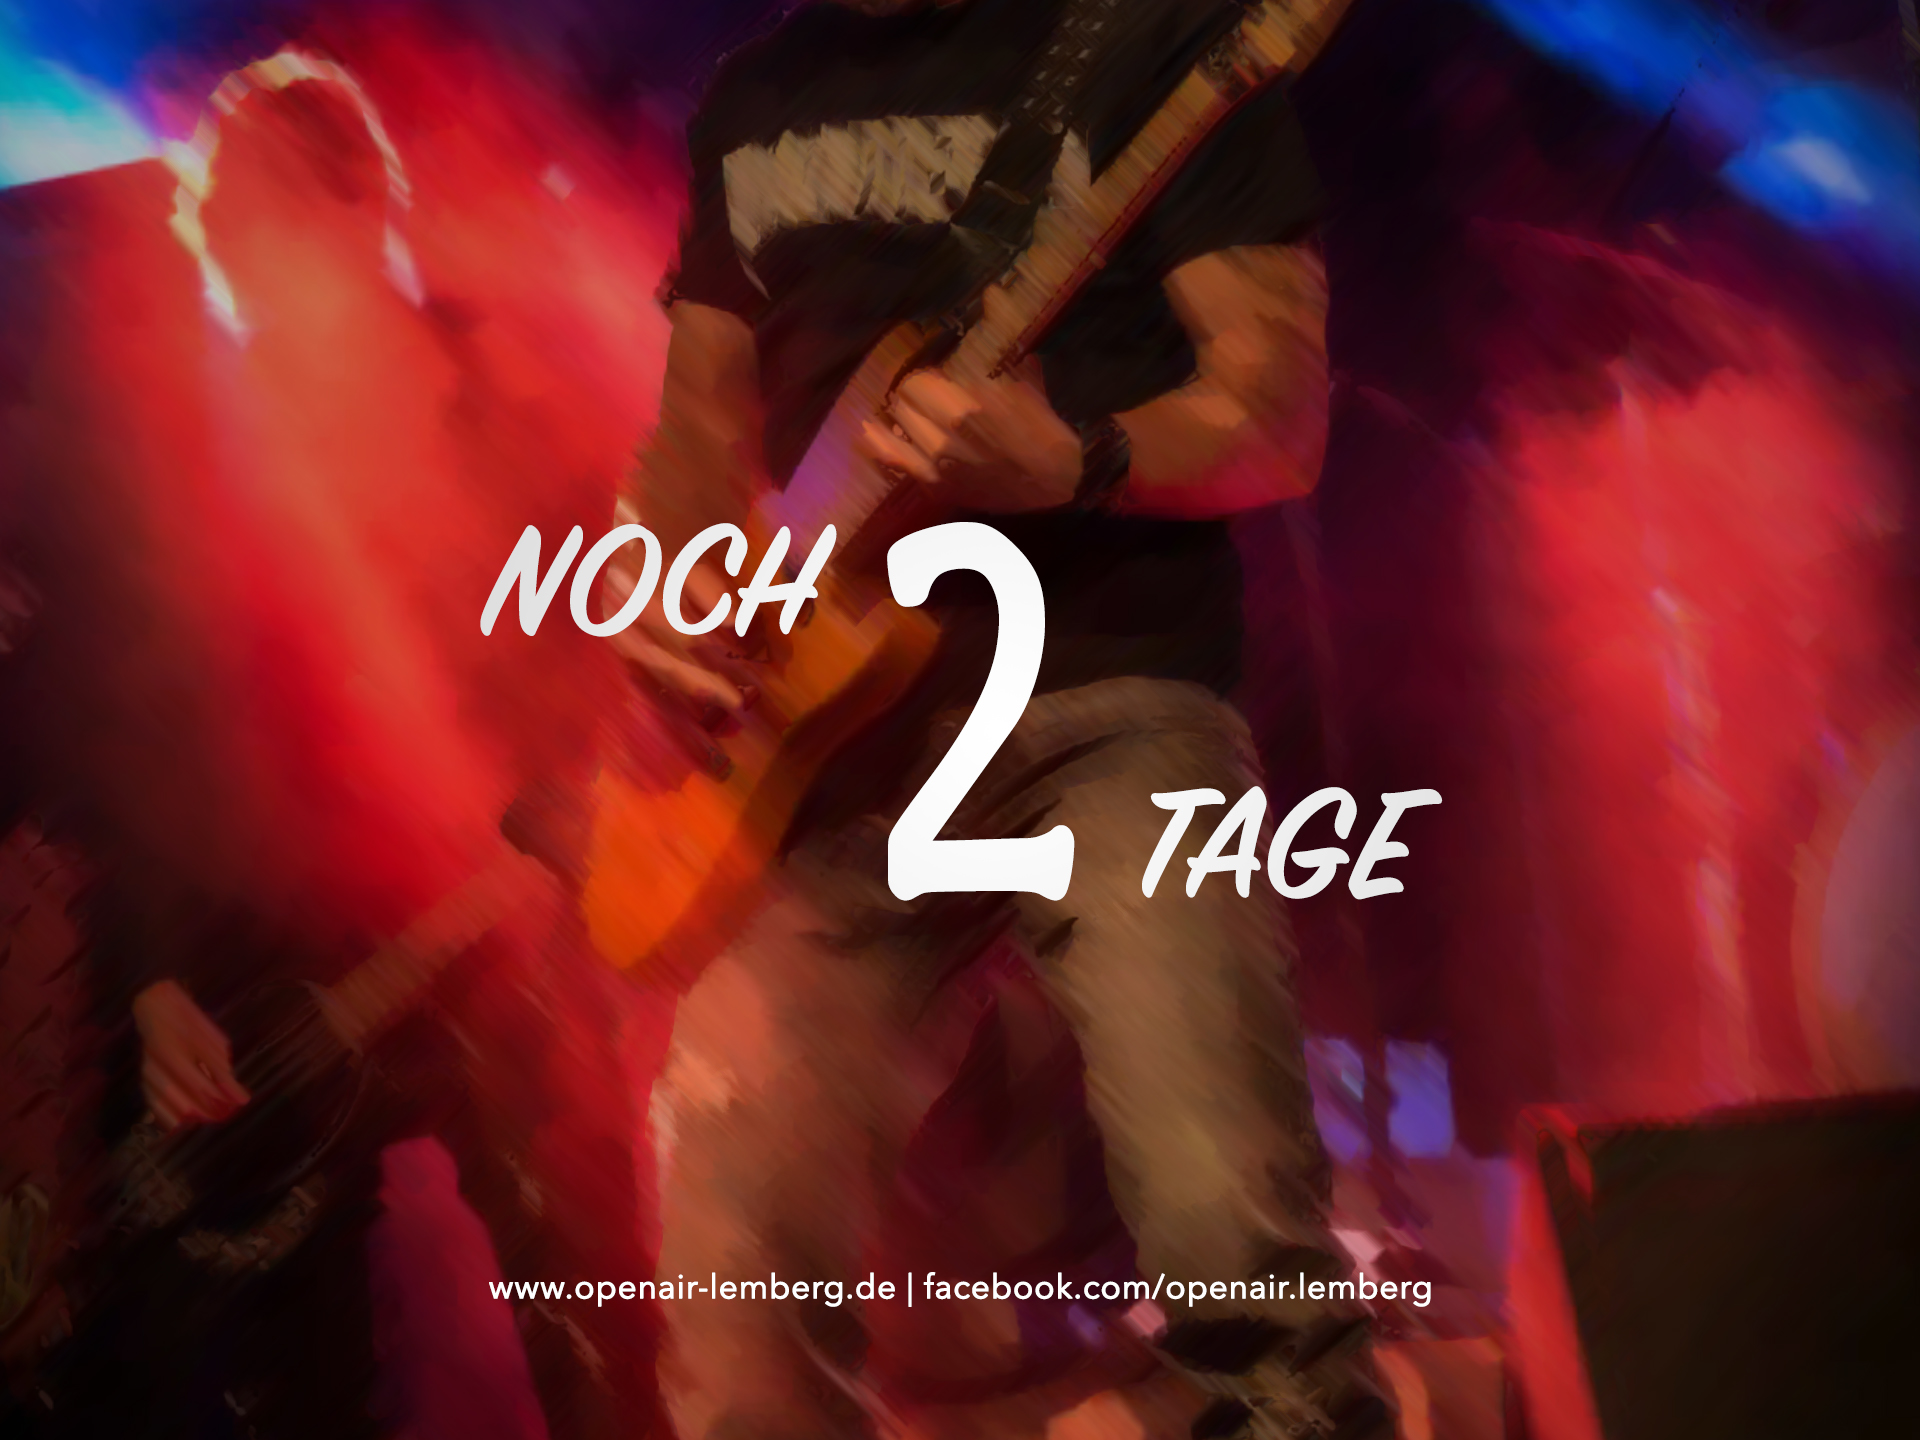 cd_2016_2tage